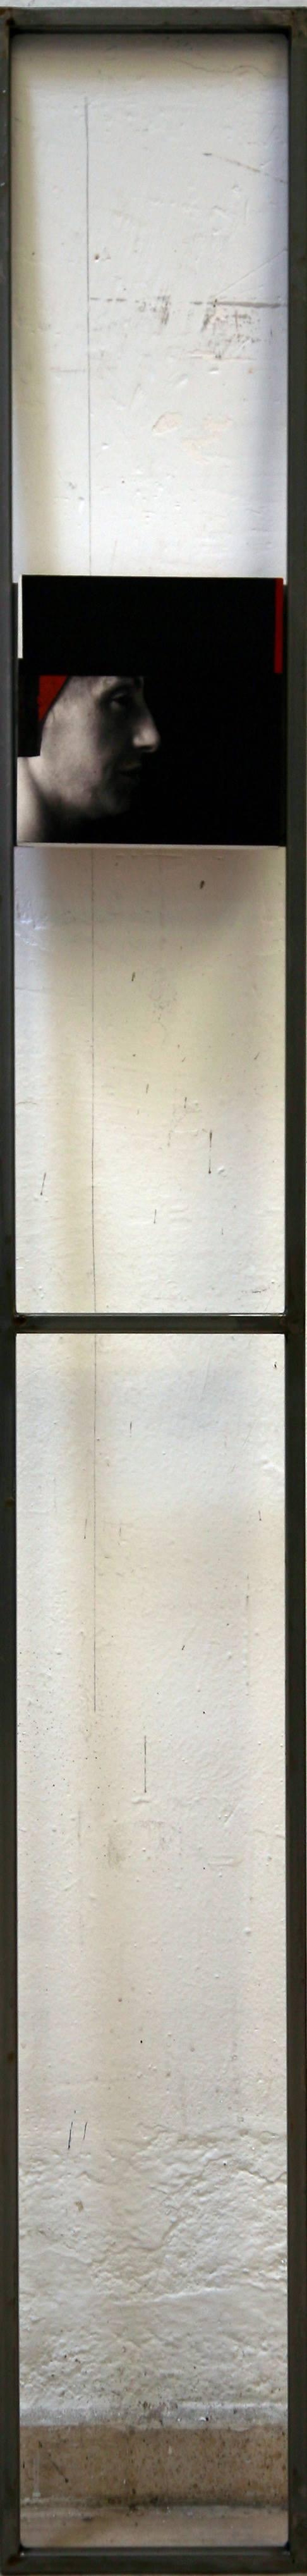 Perfil de mujer, 2010<br/>